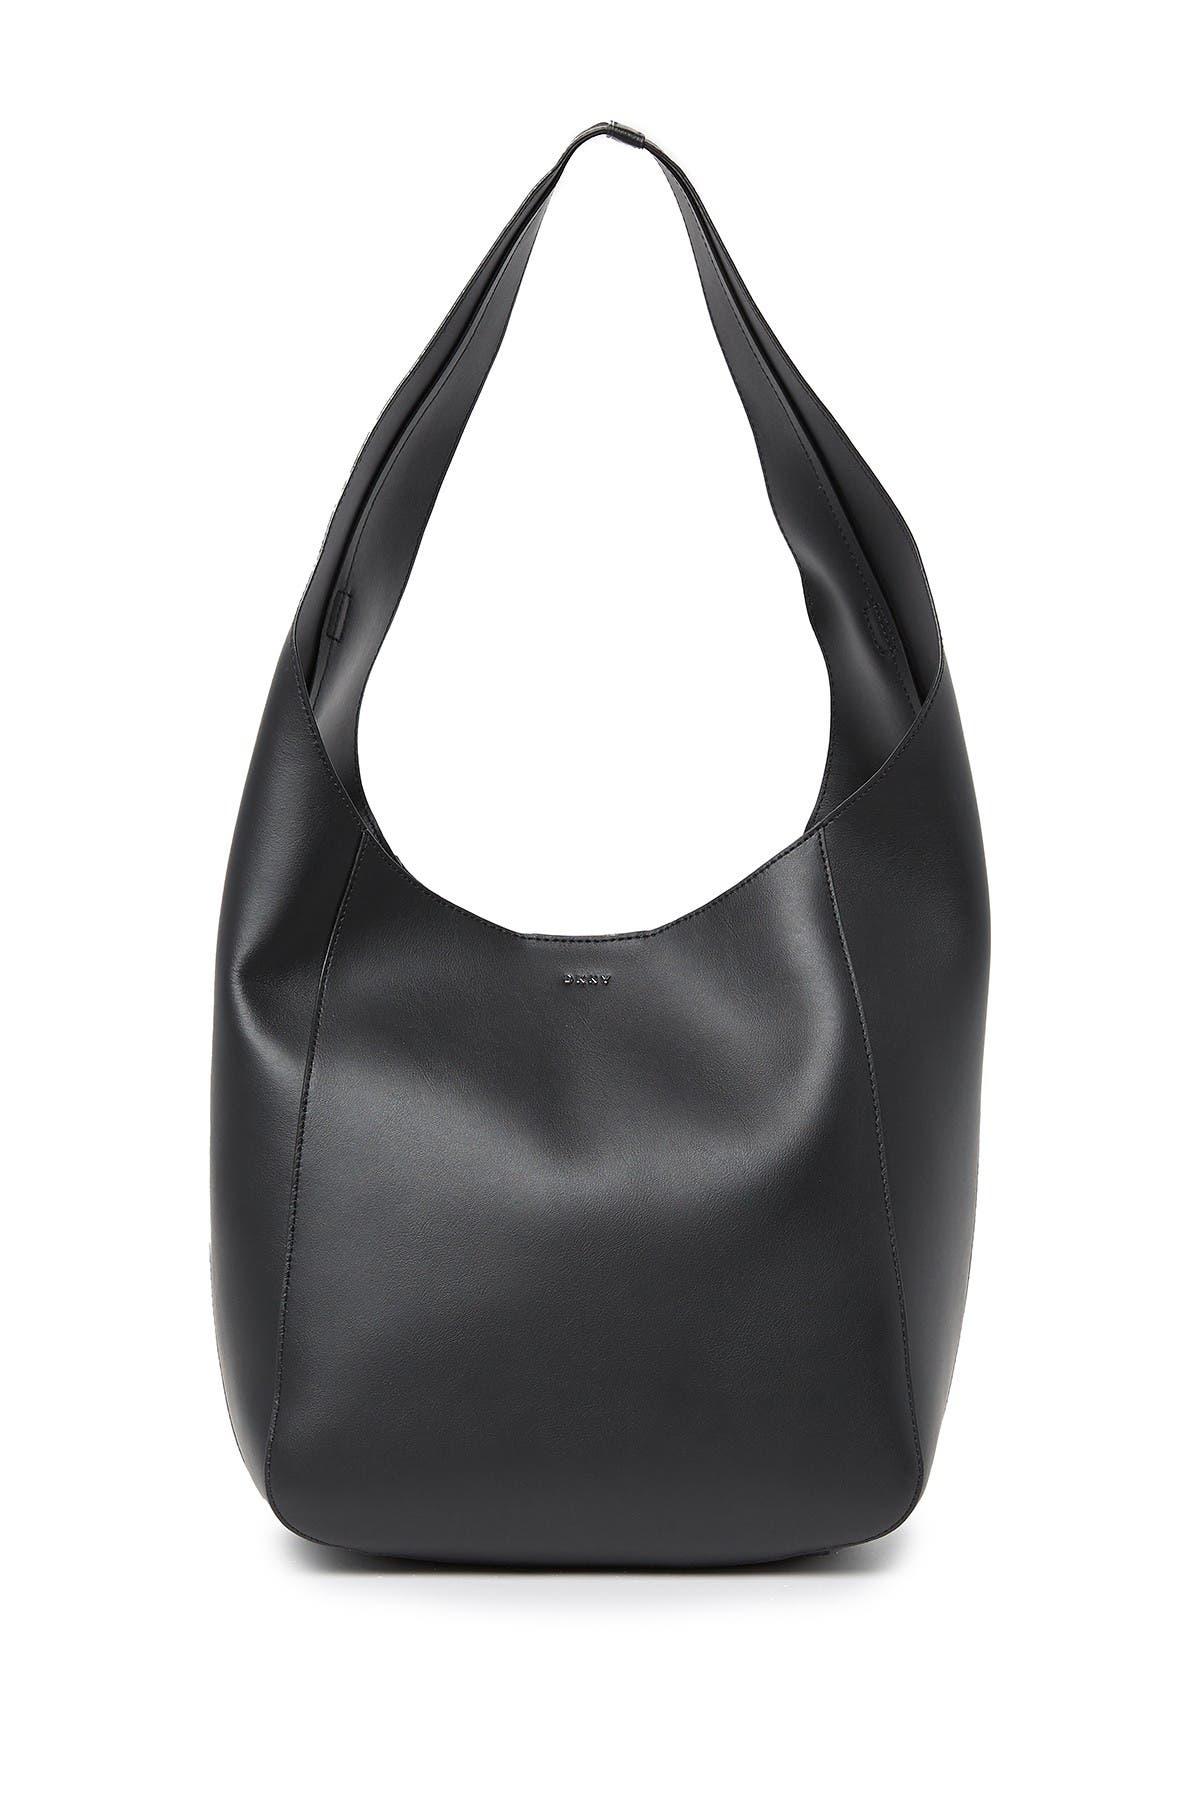 Image of DKNY Bethune Leather Chain Hobo Bag